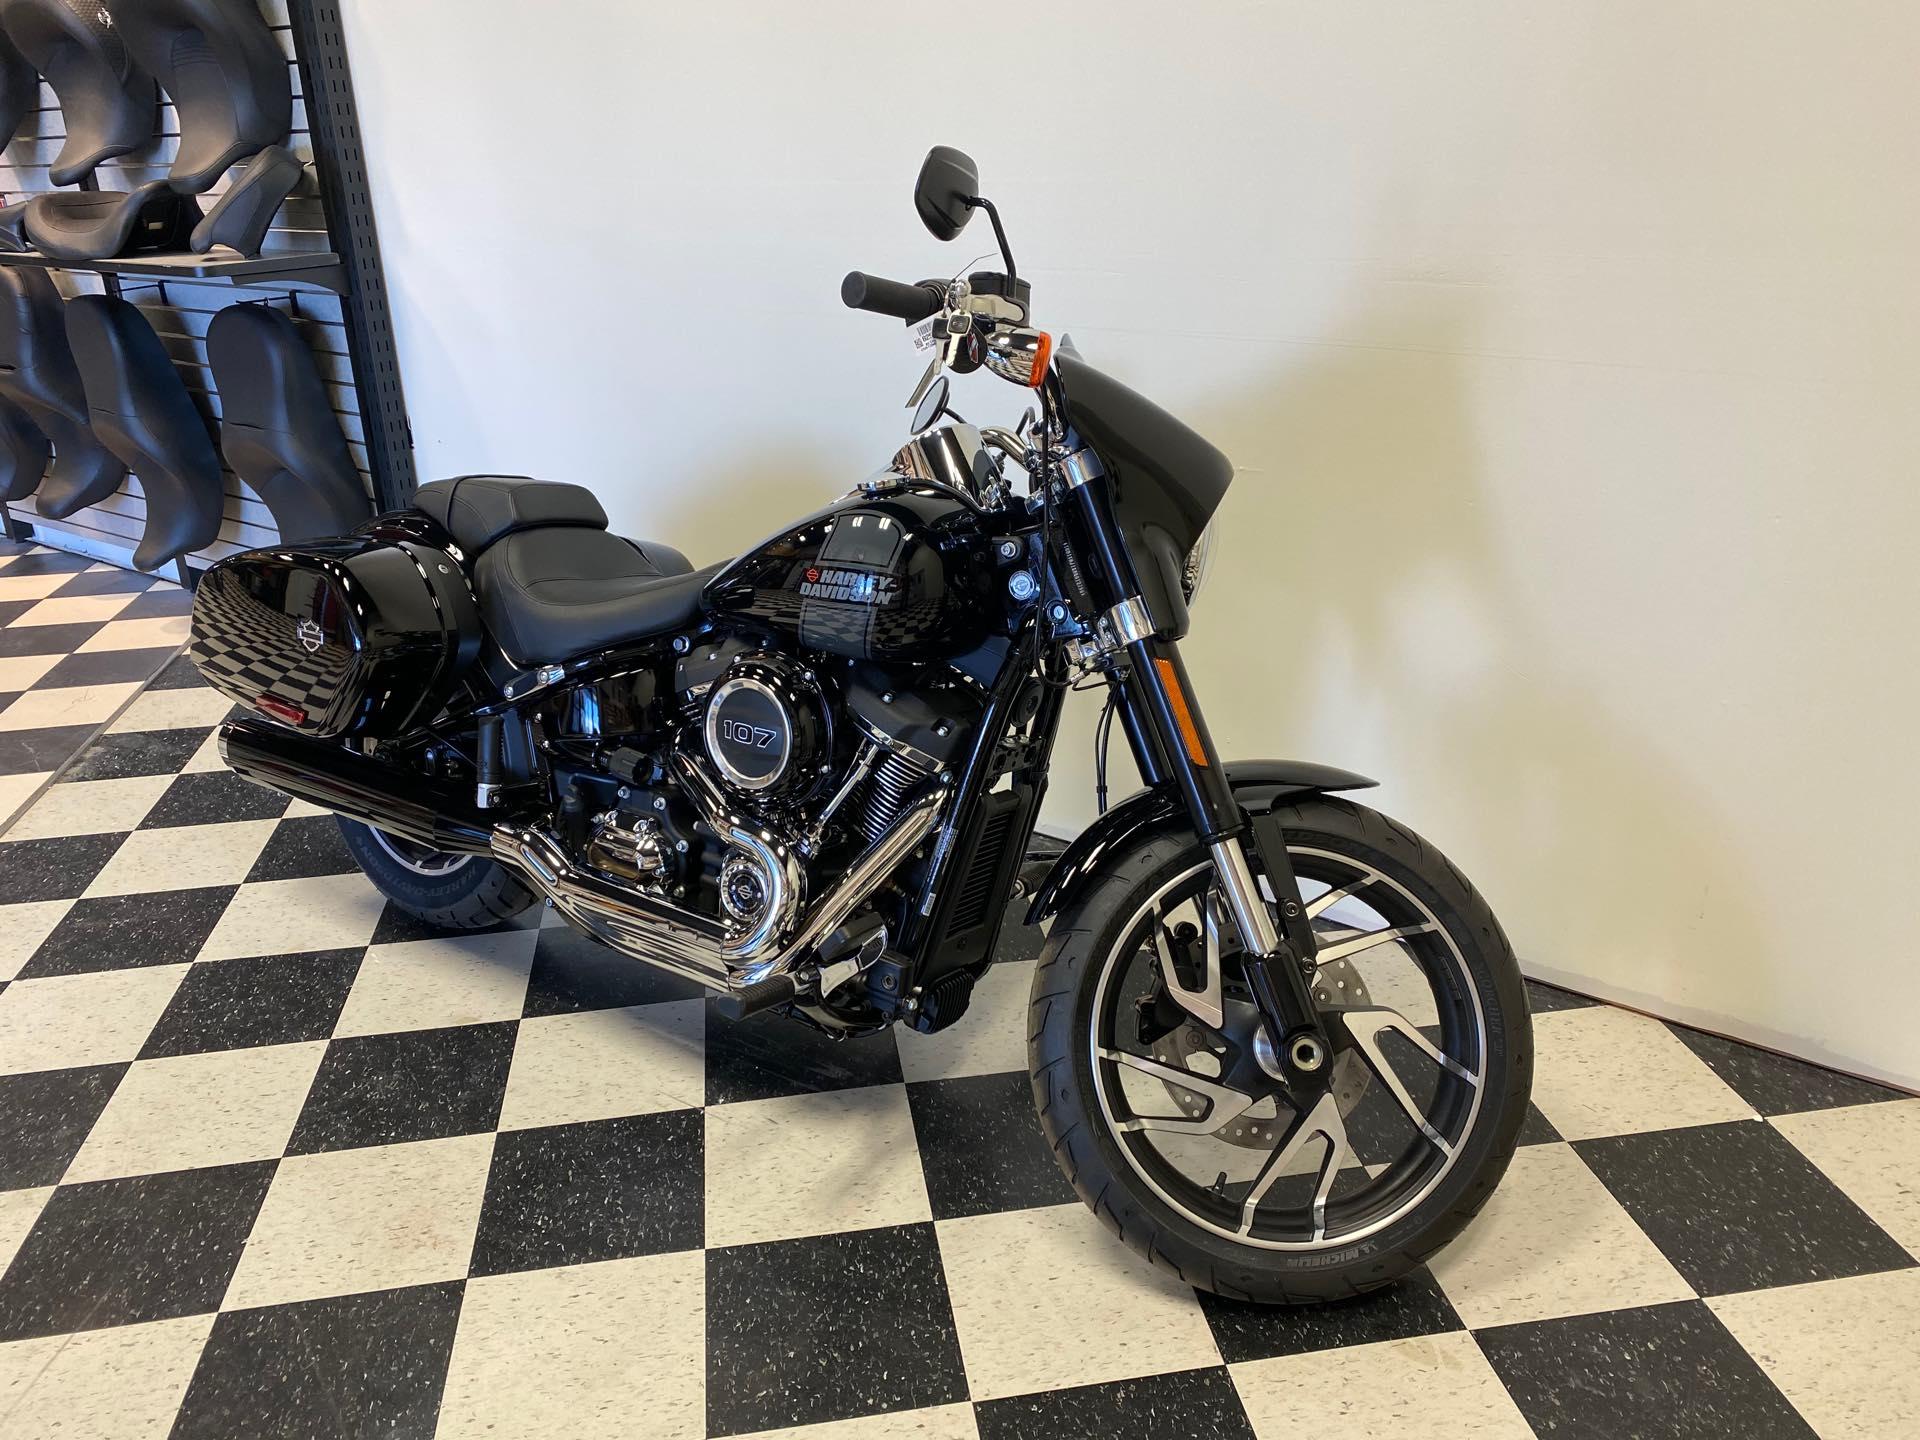 2021 Harley-Davidson Cruiser FLSB Sport Glide at Deluxe Harley Davidson